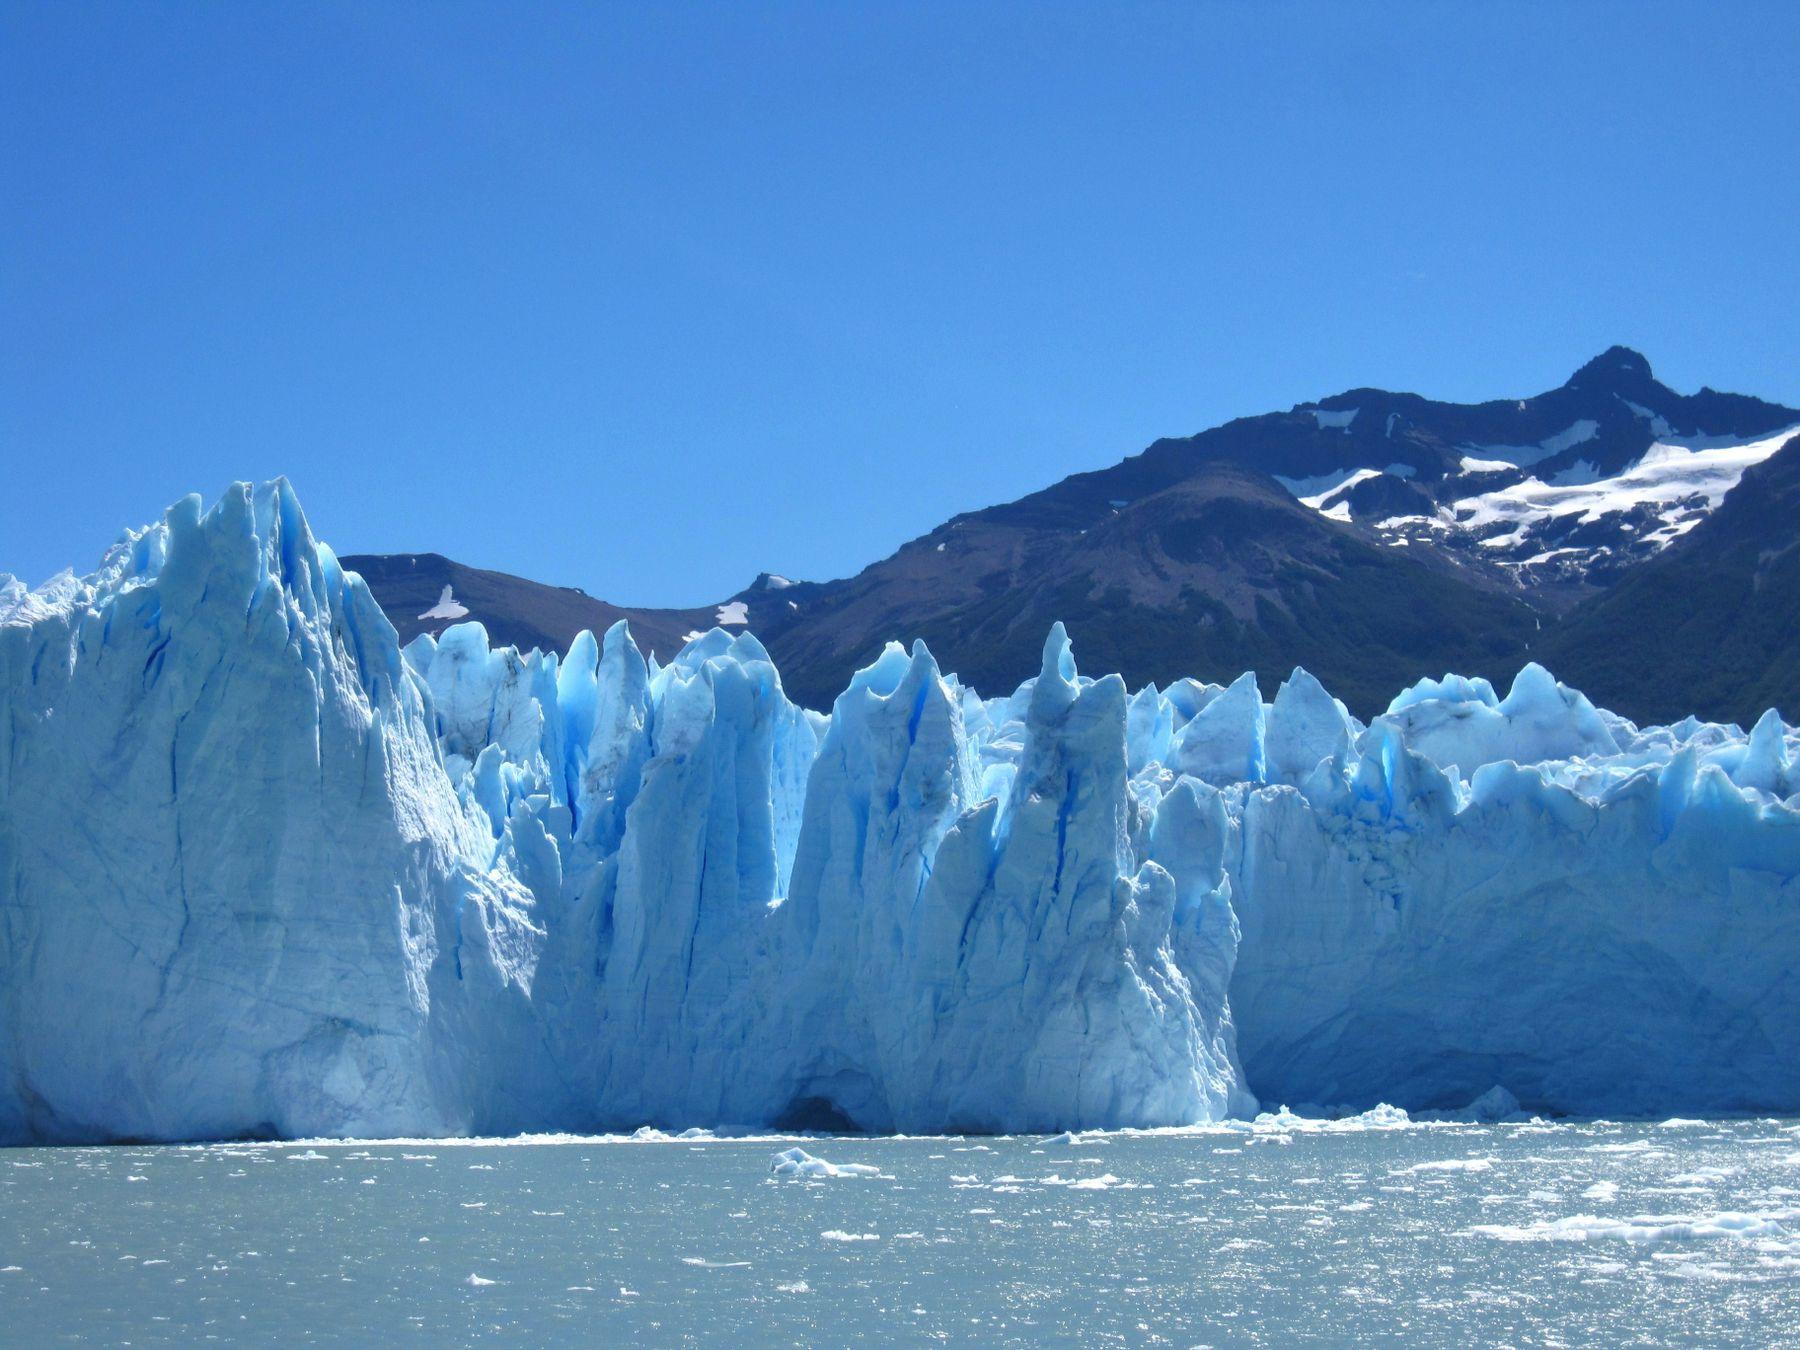 Ледник Перито-Морено. Аргентина ледник пейзаж скалы